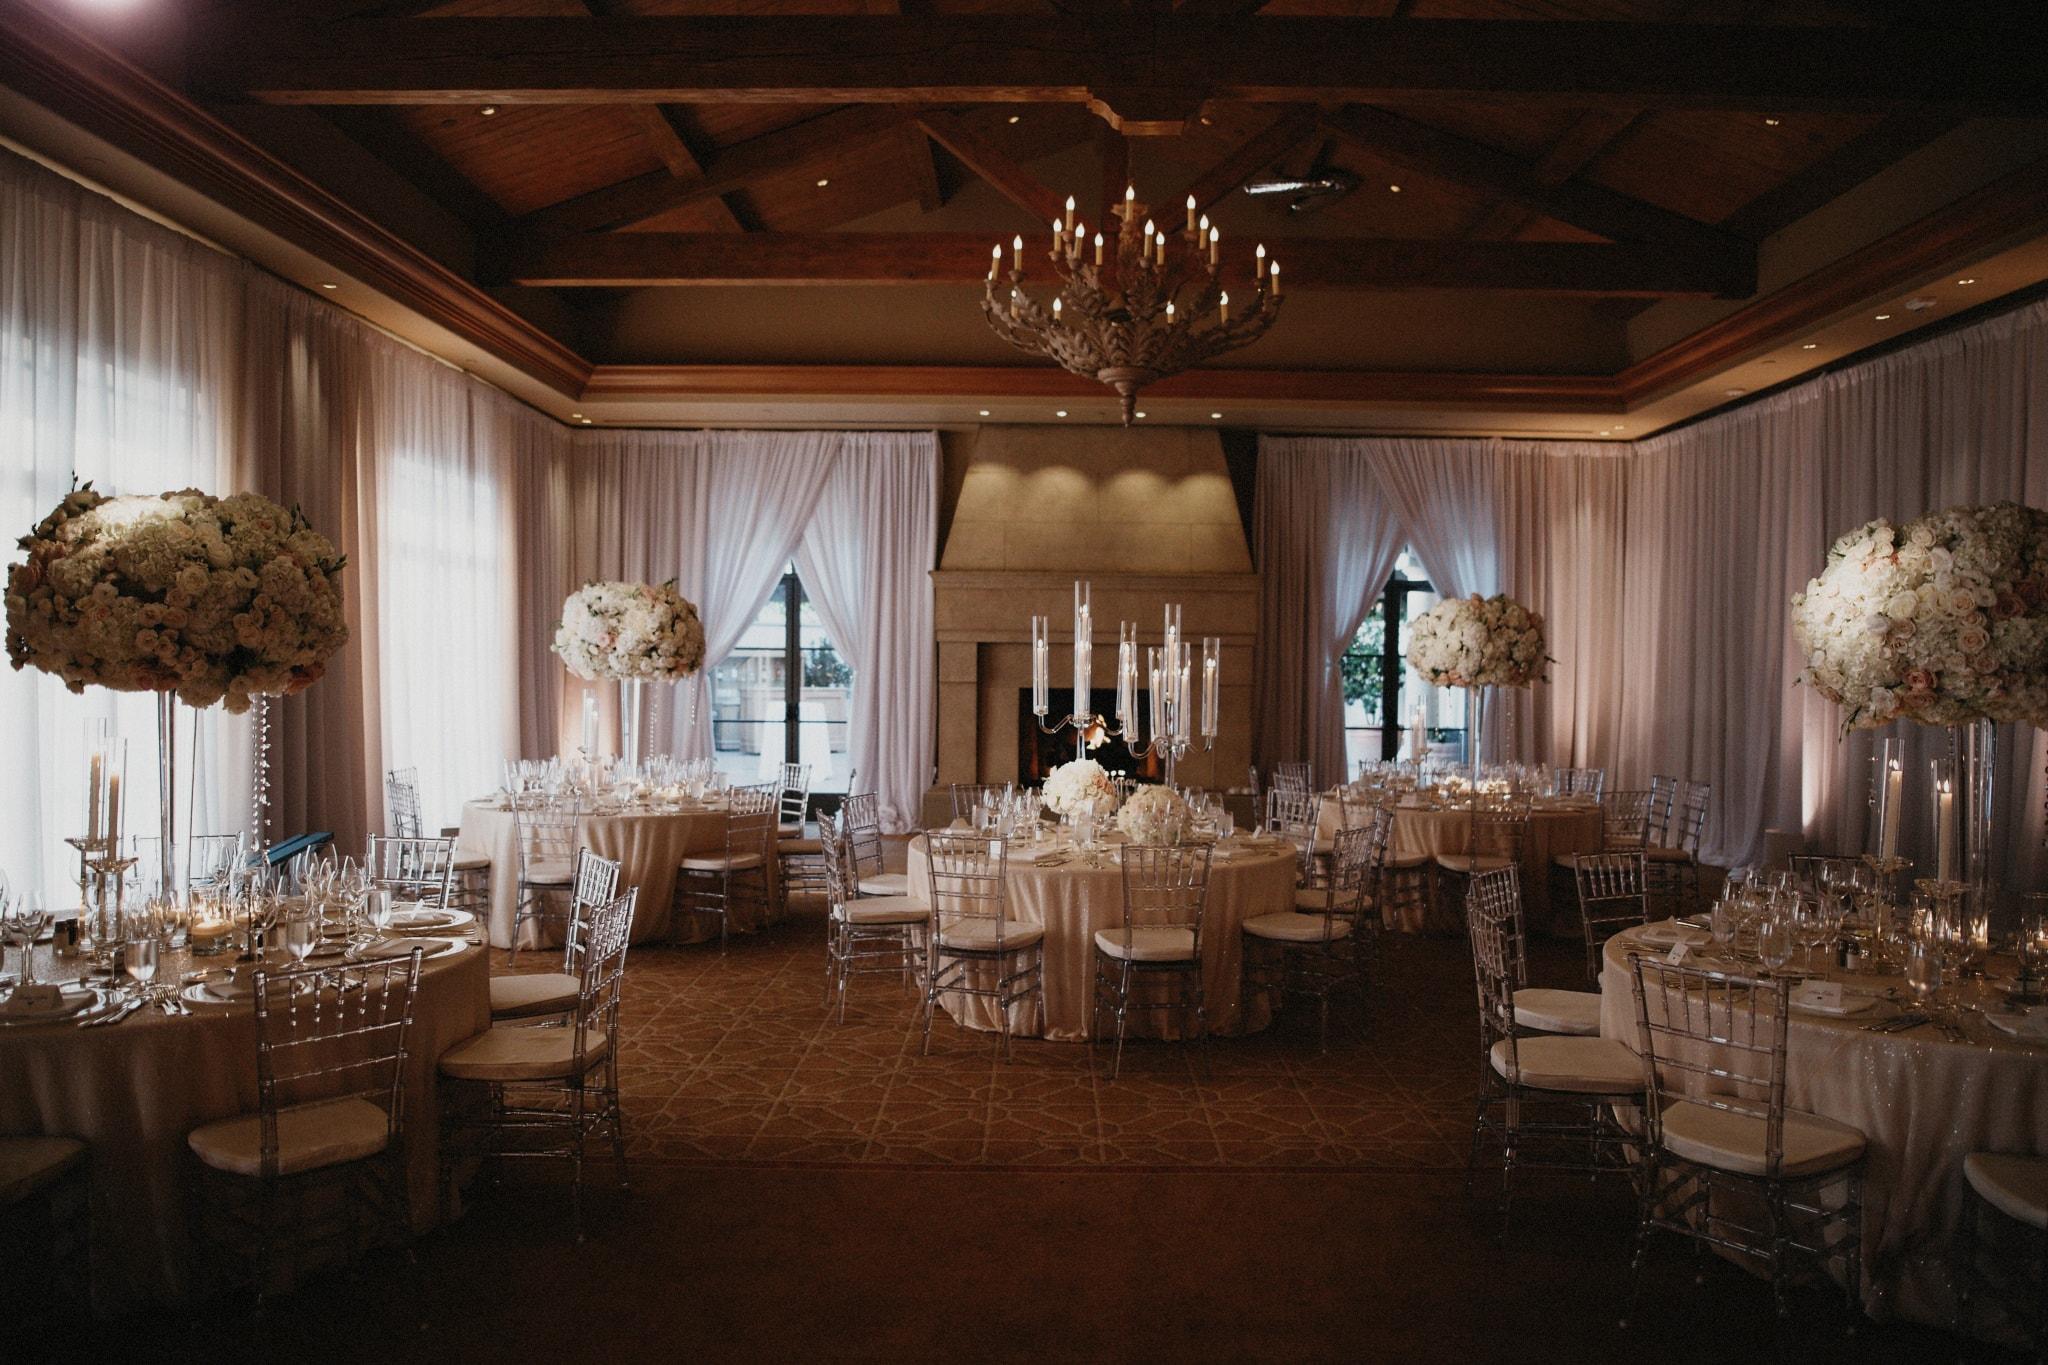 061-wedding-reception-venue-ideas.jpg